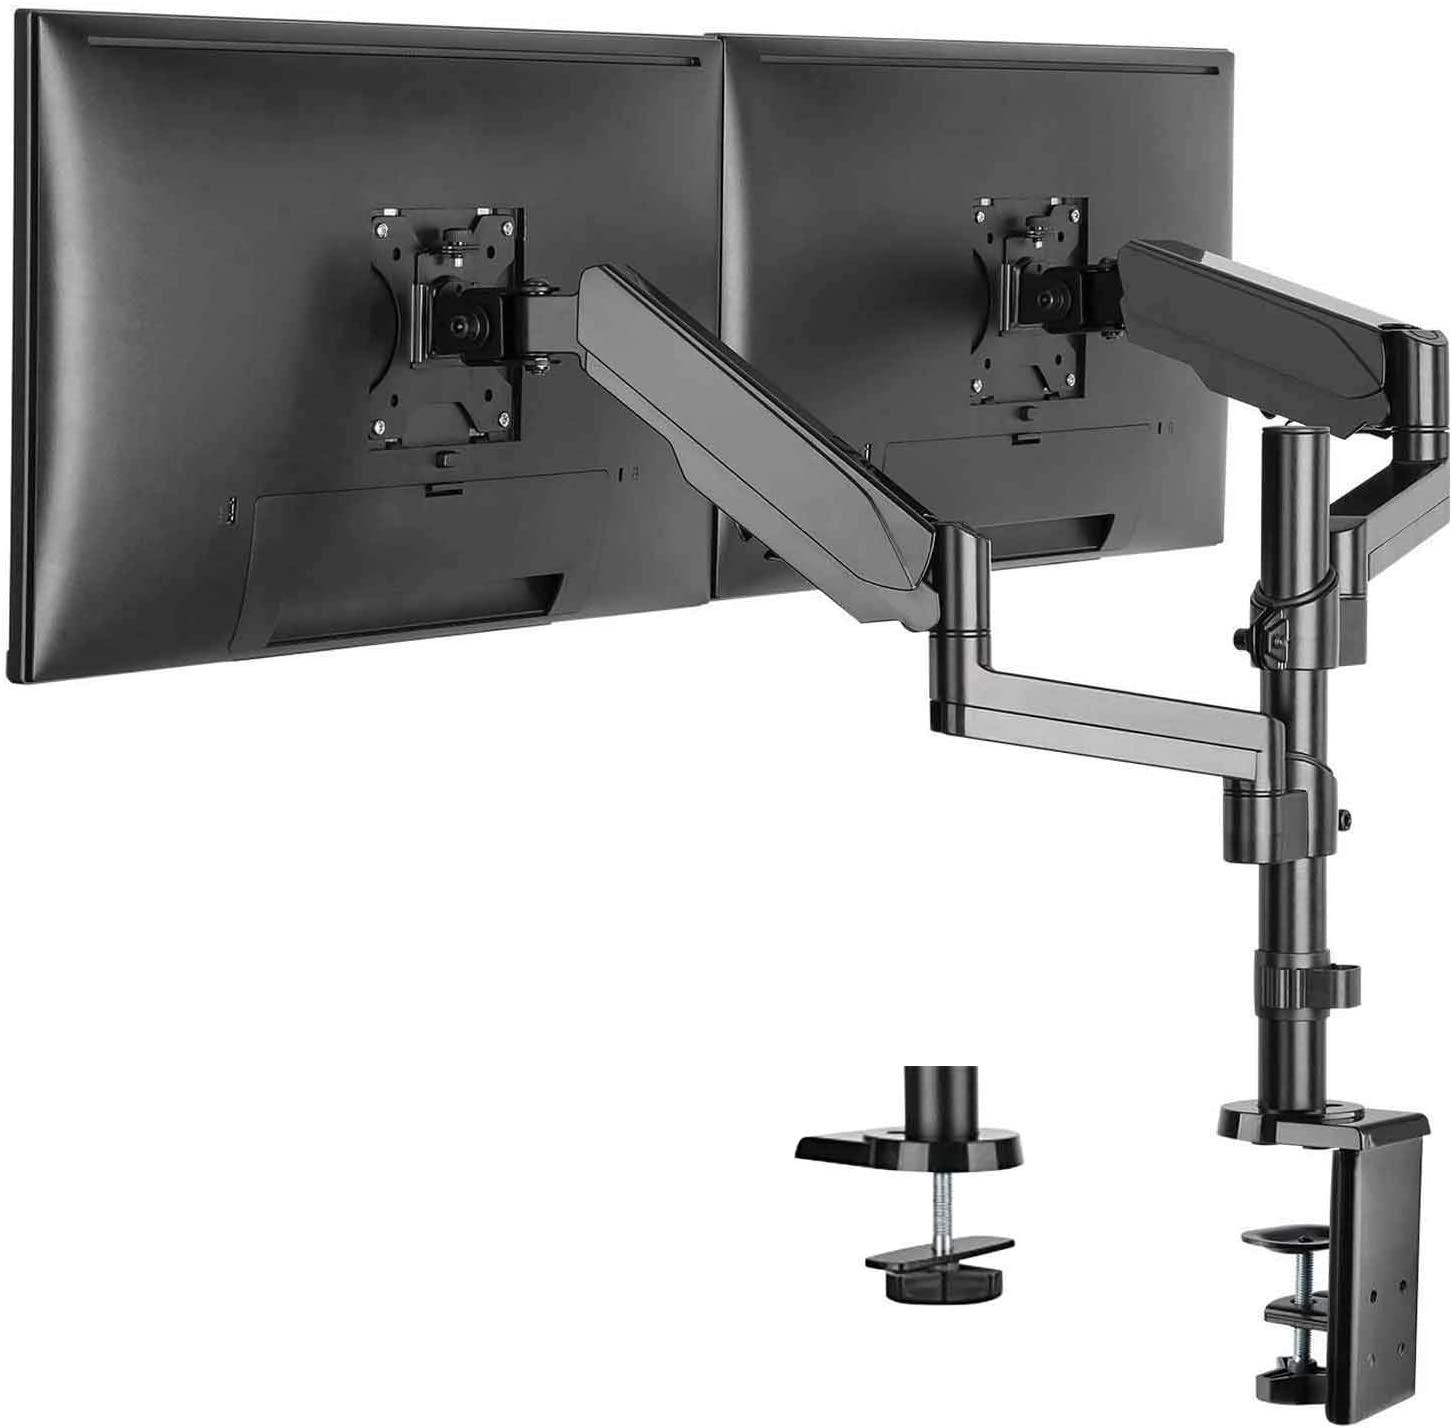 WALI Premium Dual LCD Monitor Stand (GSDM002)